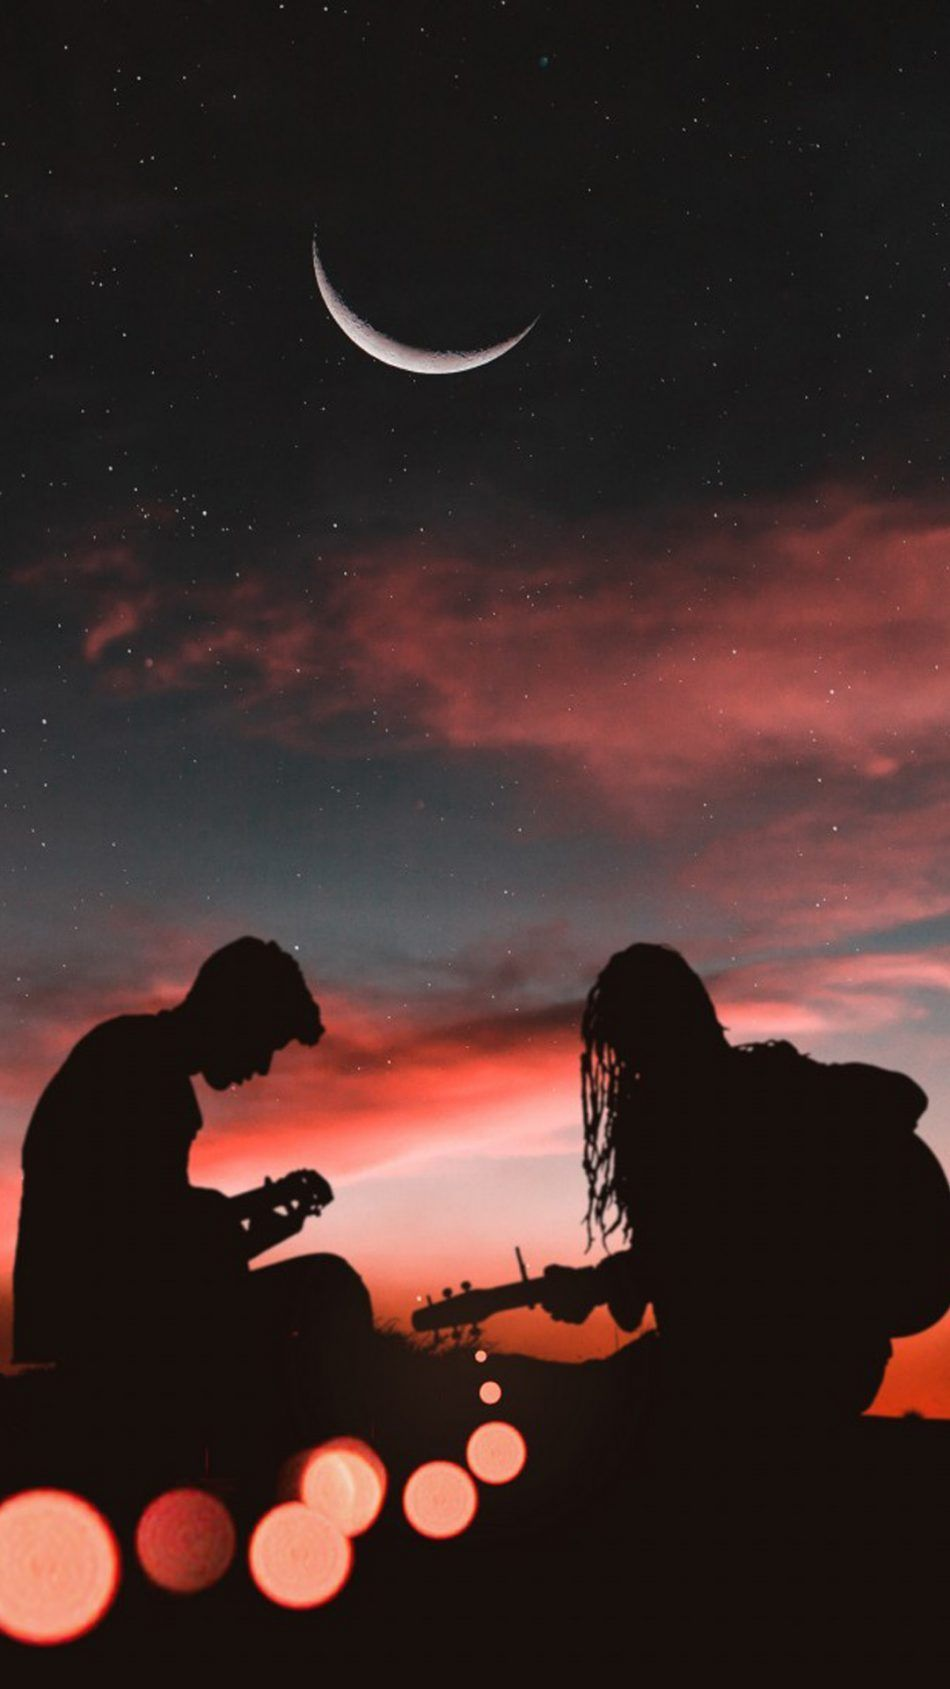 Romantic Couple Playing Guitar Sunset Half Moon Hd Mobile Wallpaper Boyfriendgoals Basili Posterler Resimler Yaratici Fotografcilik